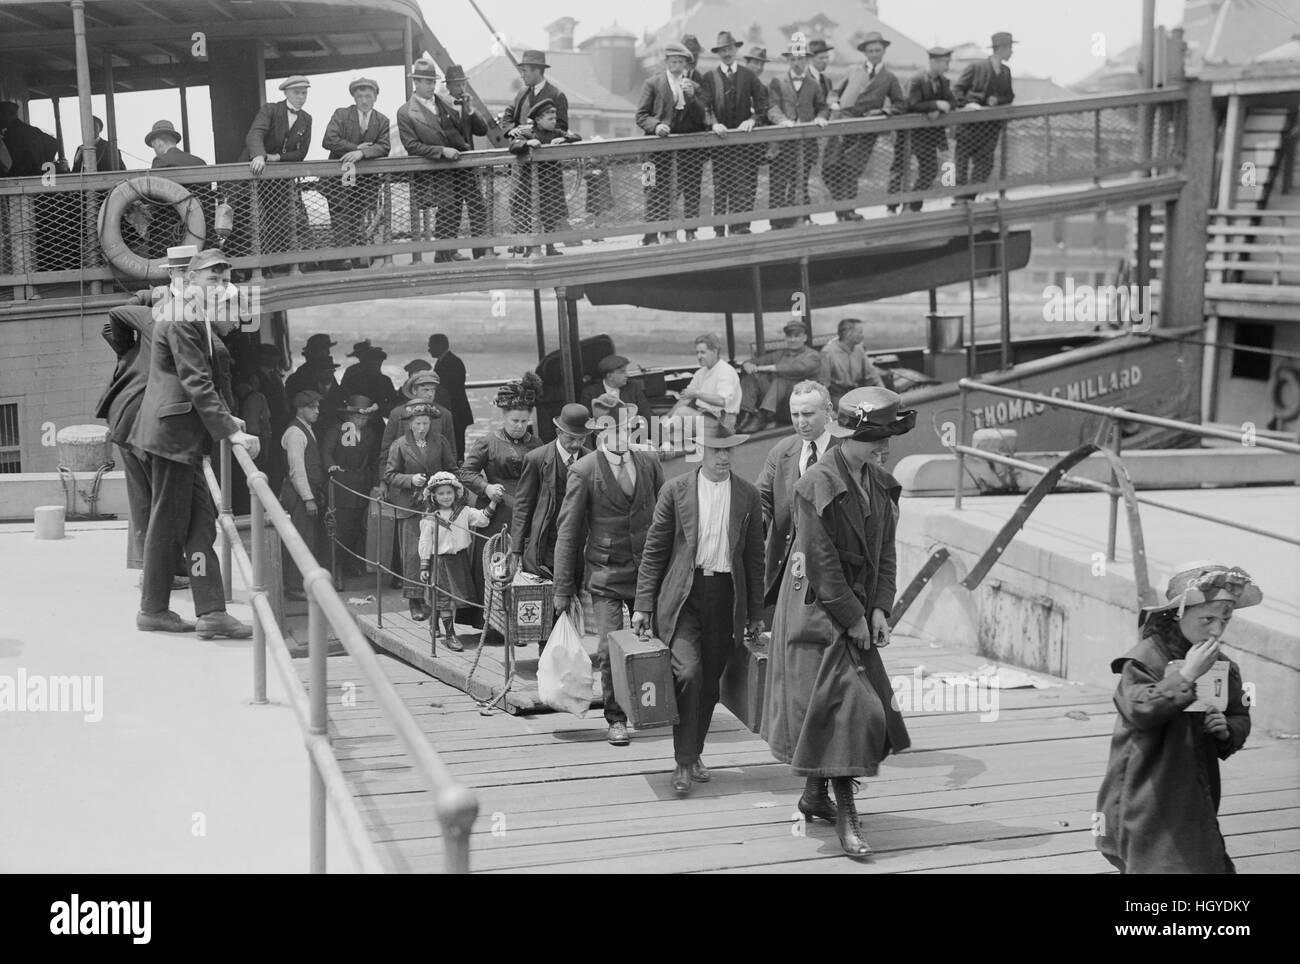 Arrival Of Immigrants Ellis Island New York City New